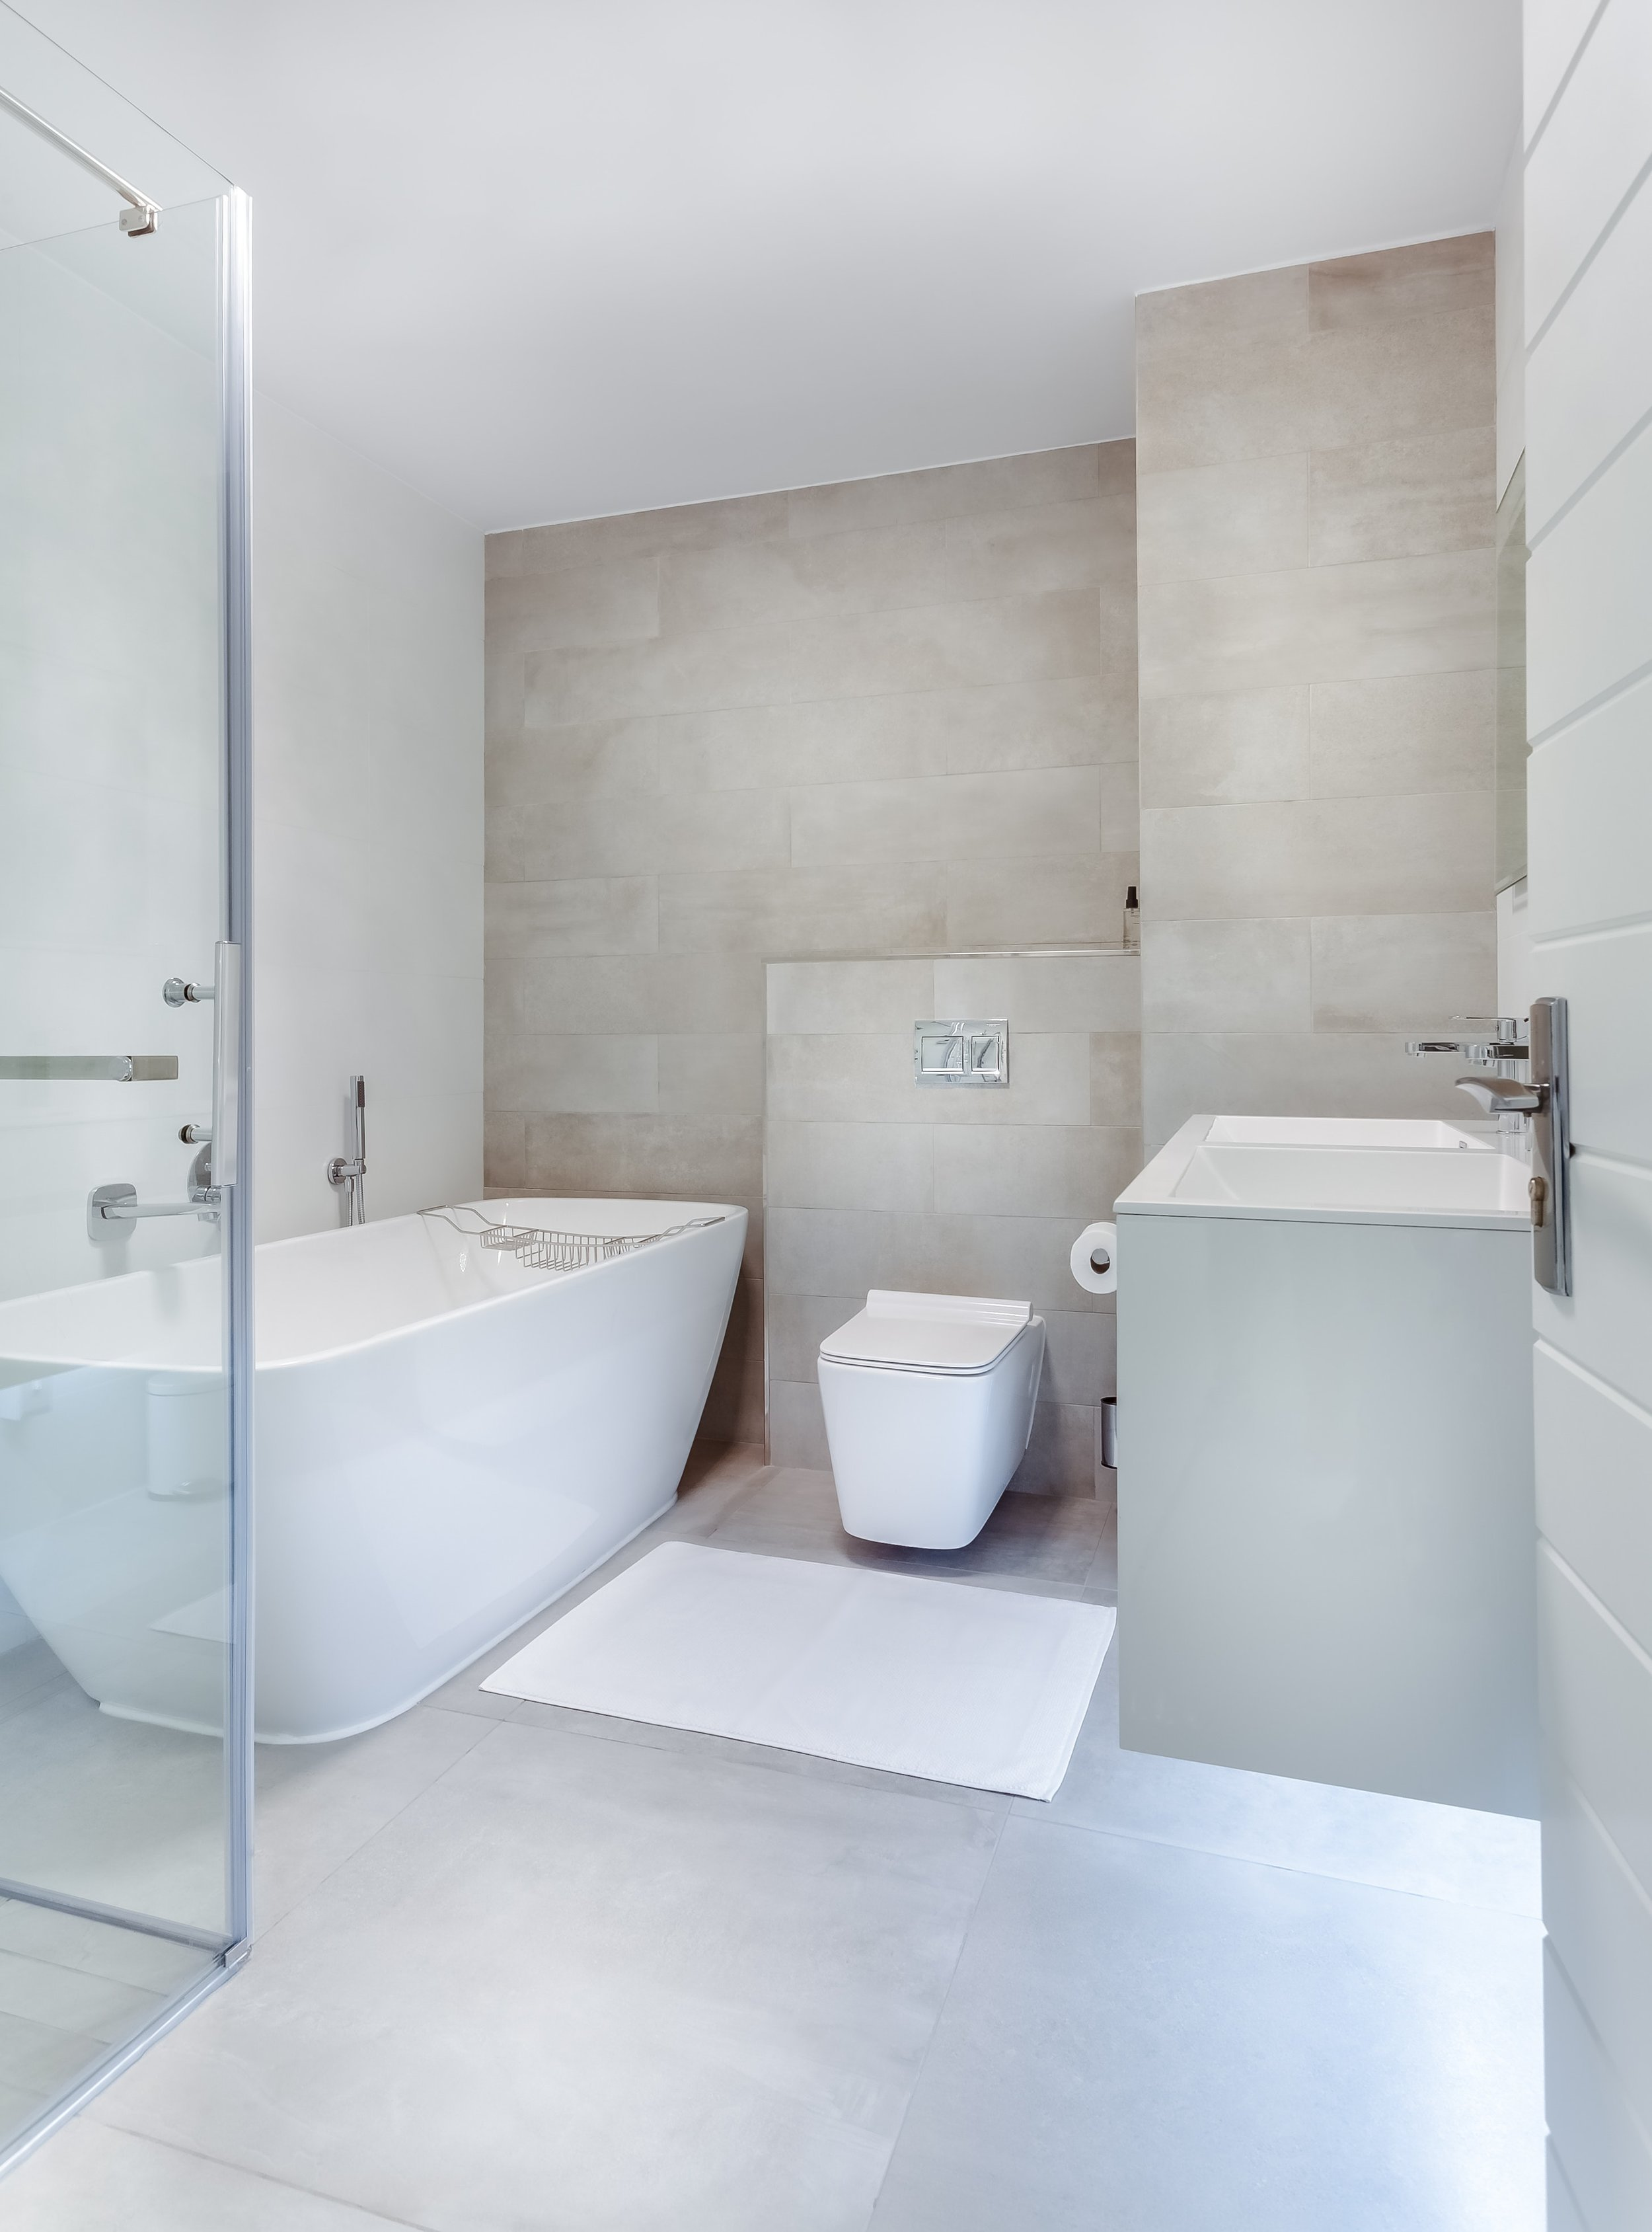 Radiant Floor Heating In Bathrooms Is It Worth It